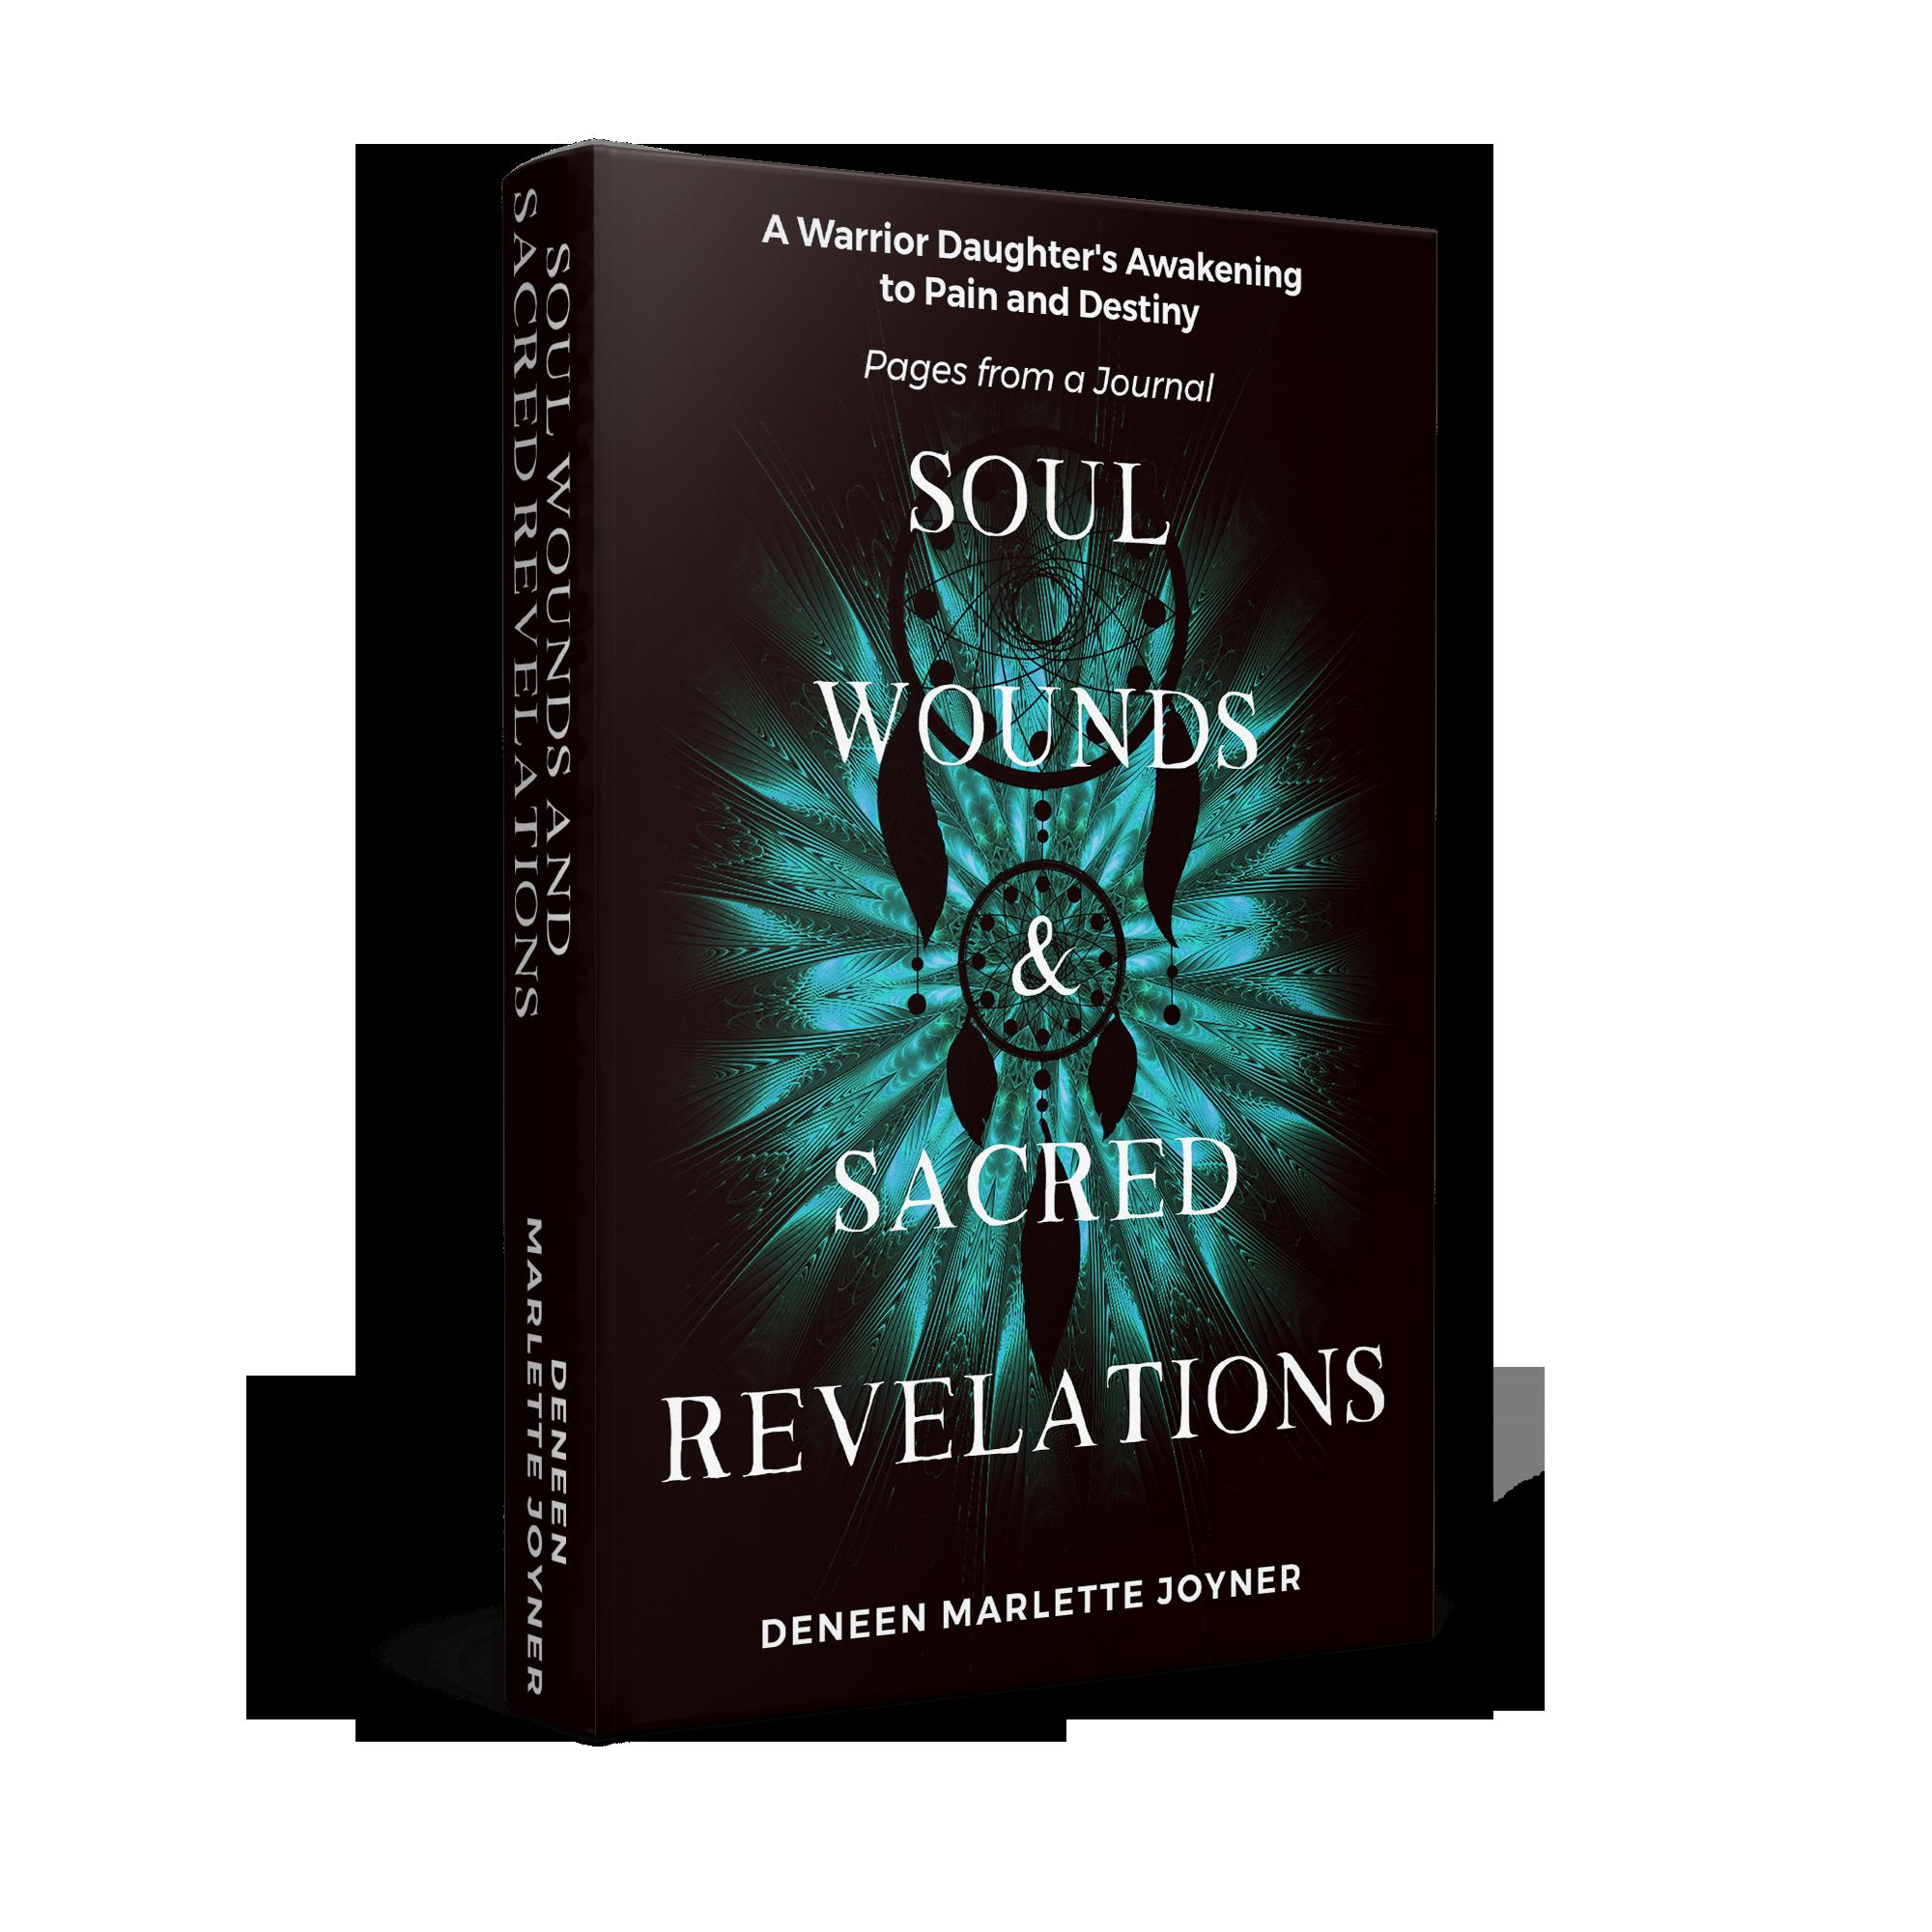 Soul Wounds & Sacred Revelations (Cover design #2)